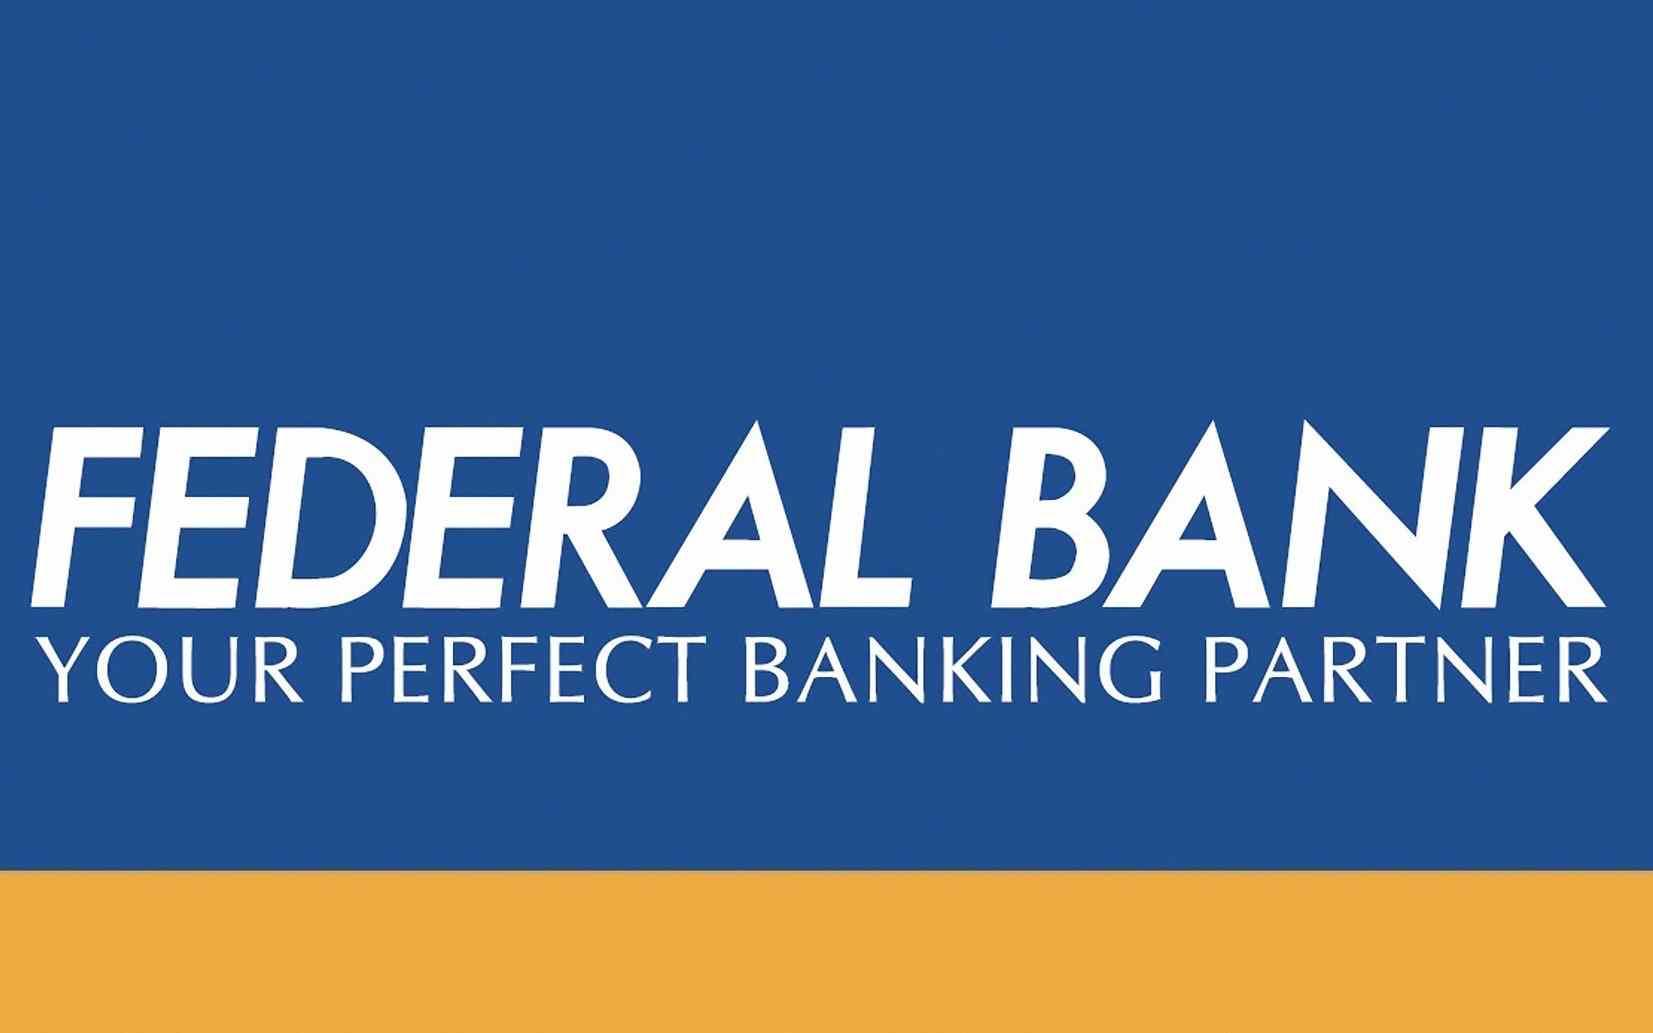 Federal Bank Savings Account